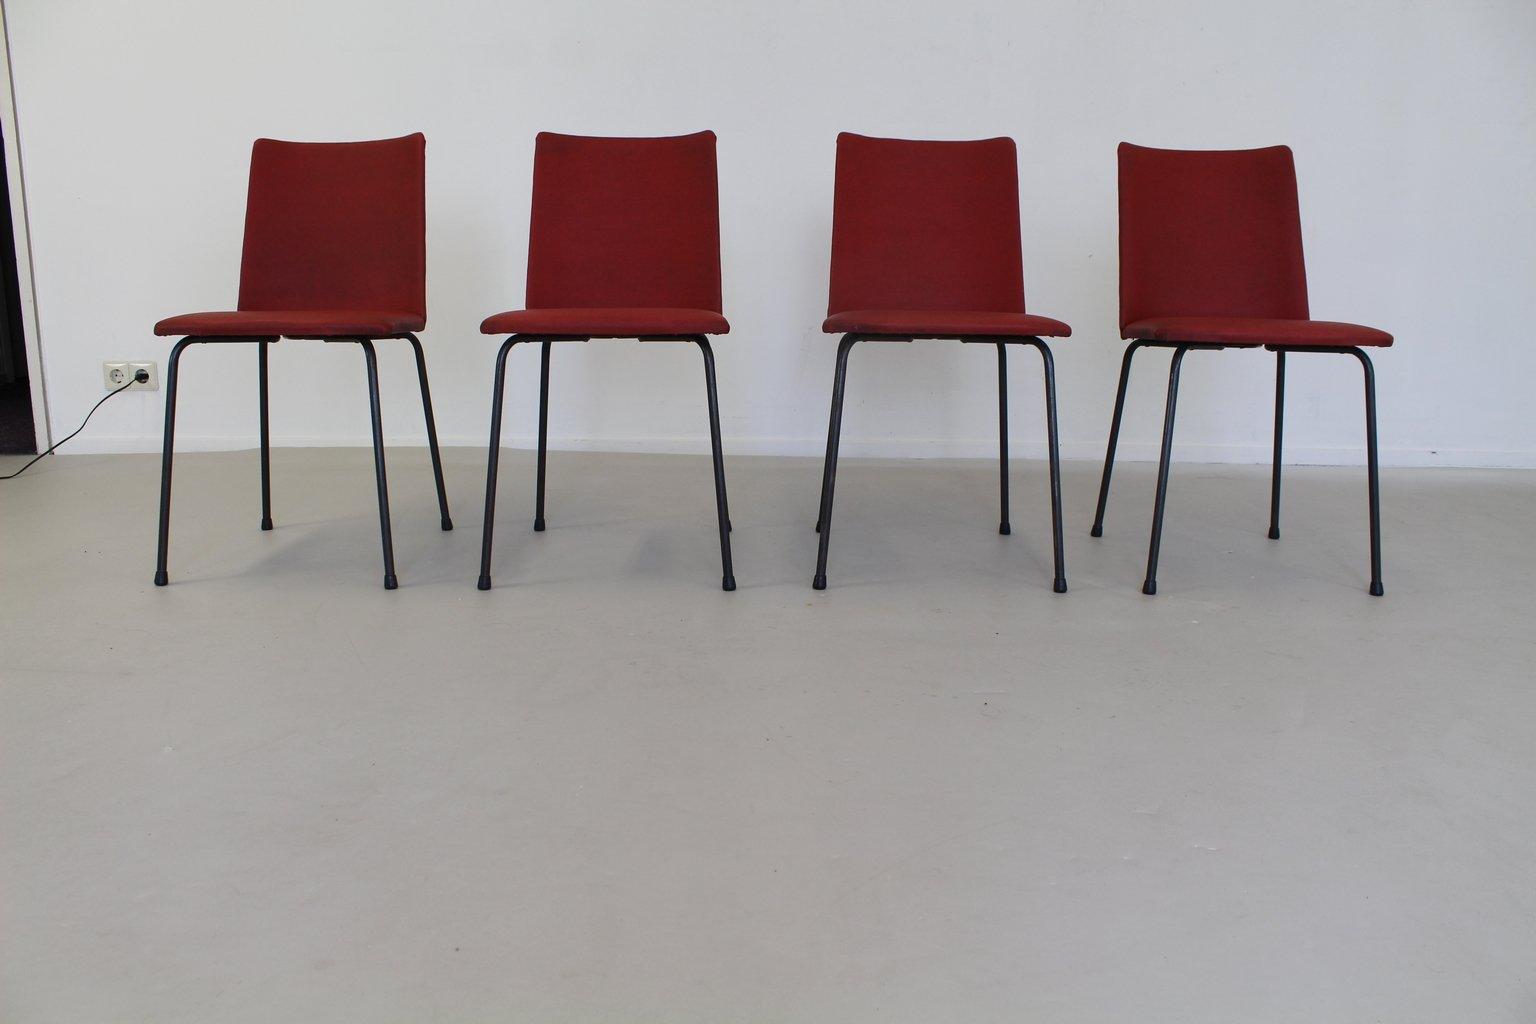 Dutch Kitchen Chairs By Hein Salomonsen For Ap Originals 1960 Set Of 4 For Sale At Pamono